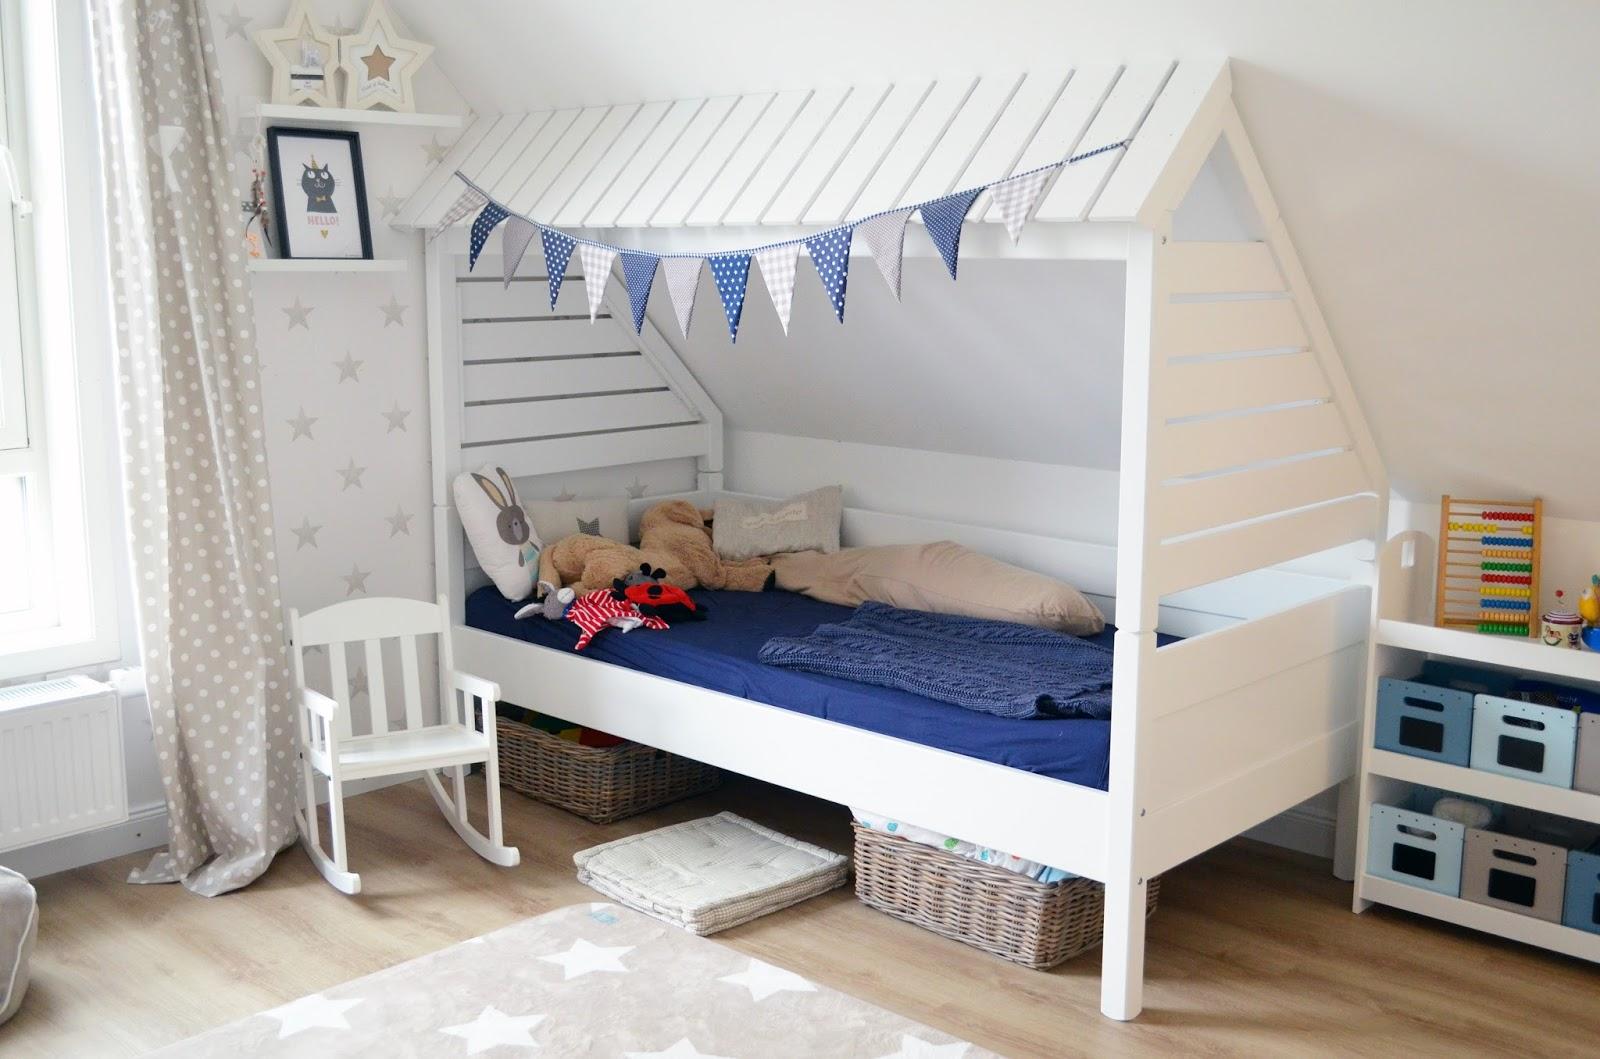 arbeitszimmer ideen. Black Bedroom Furniture Sets. Home Design Ideas